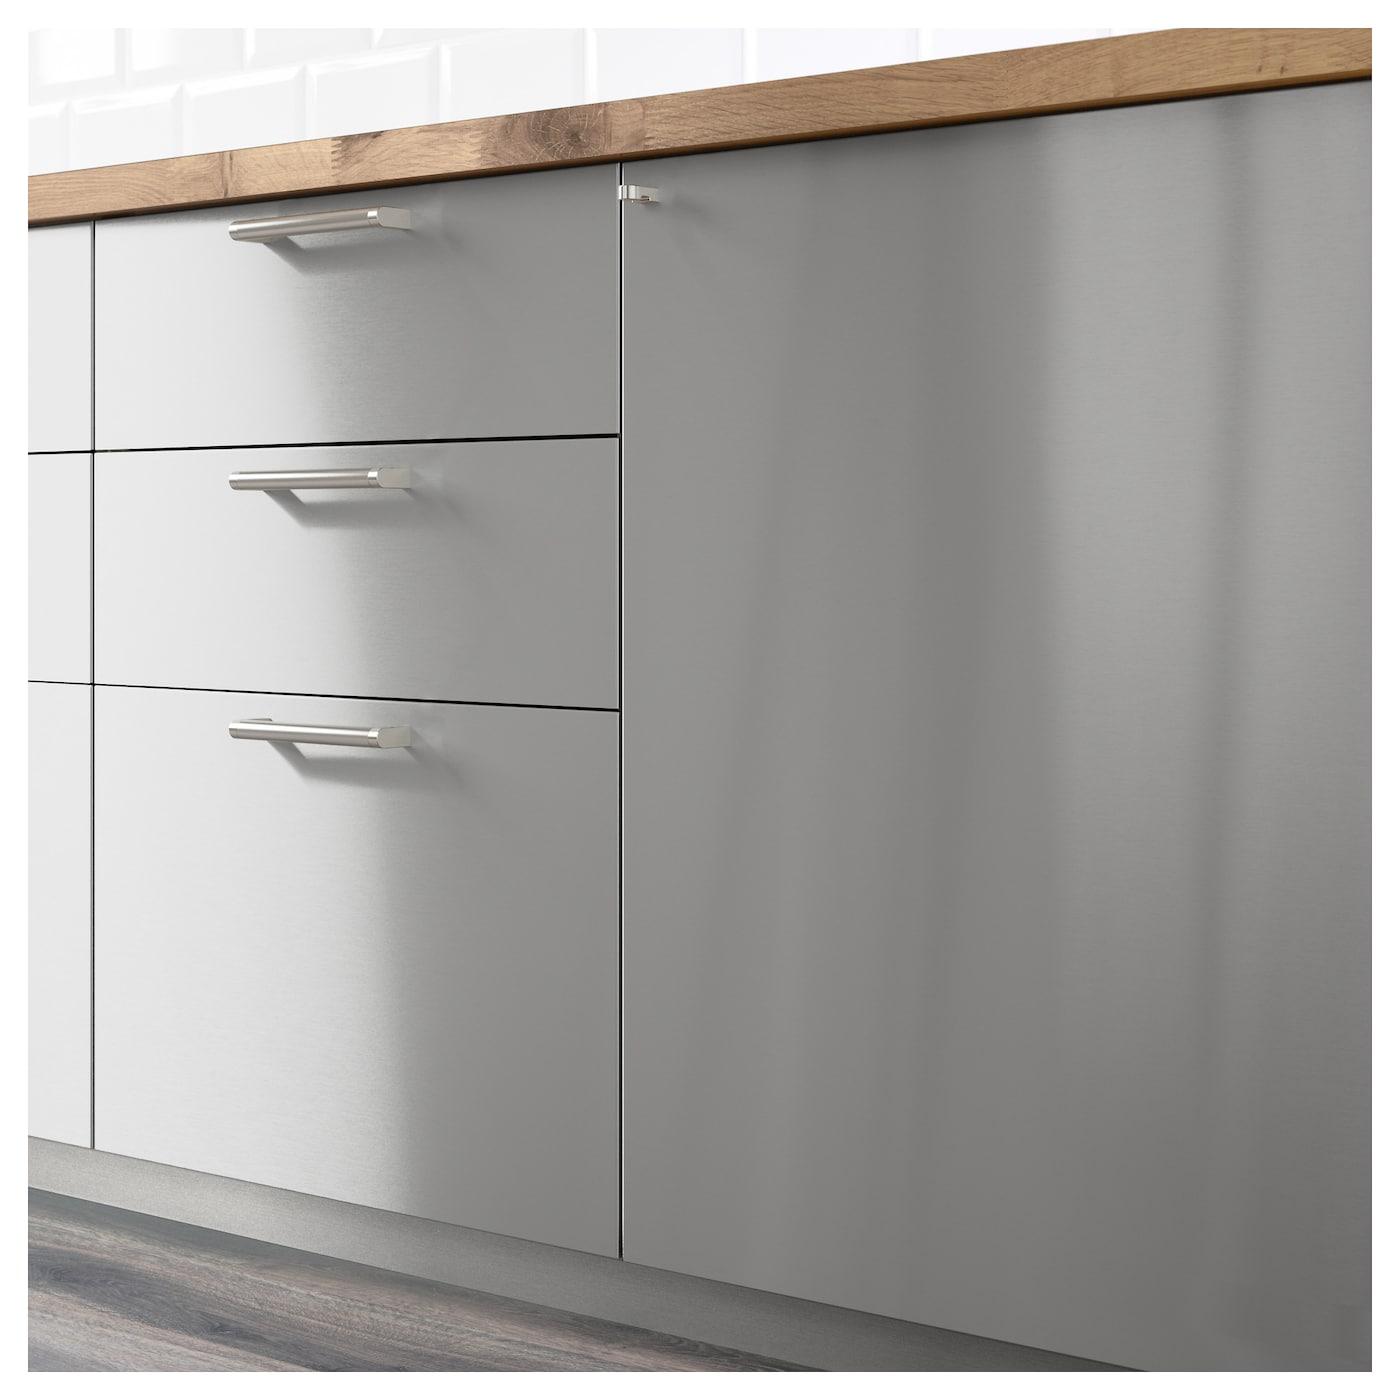 grevsta fa ade pour lave vaisselle acier inoxydable 45 x 80 cm ikea. Black Bedroom Furniture Sets. Home Design Ideas